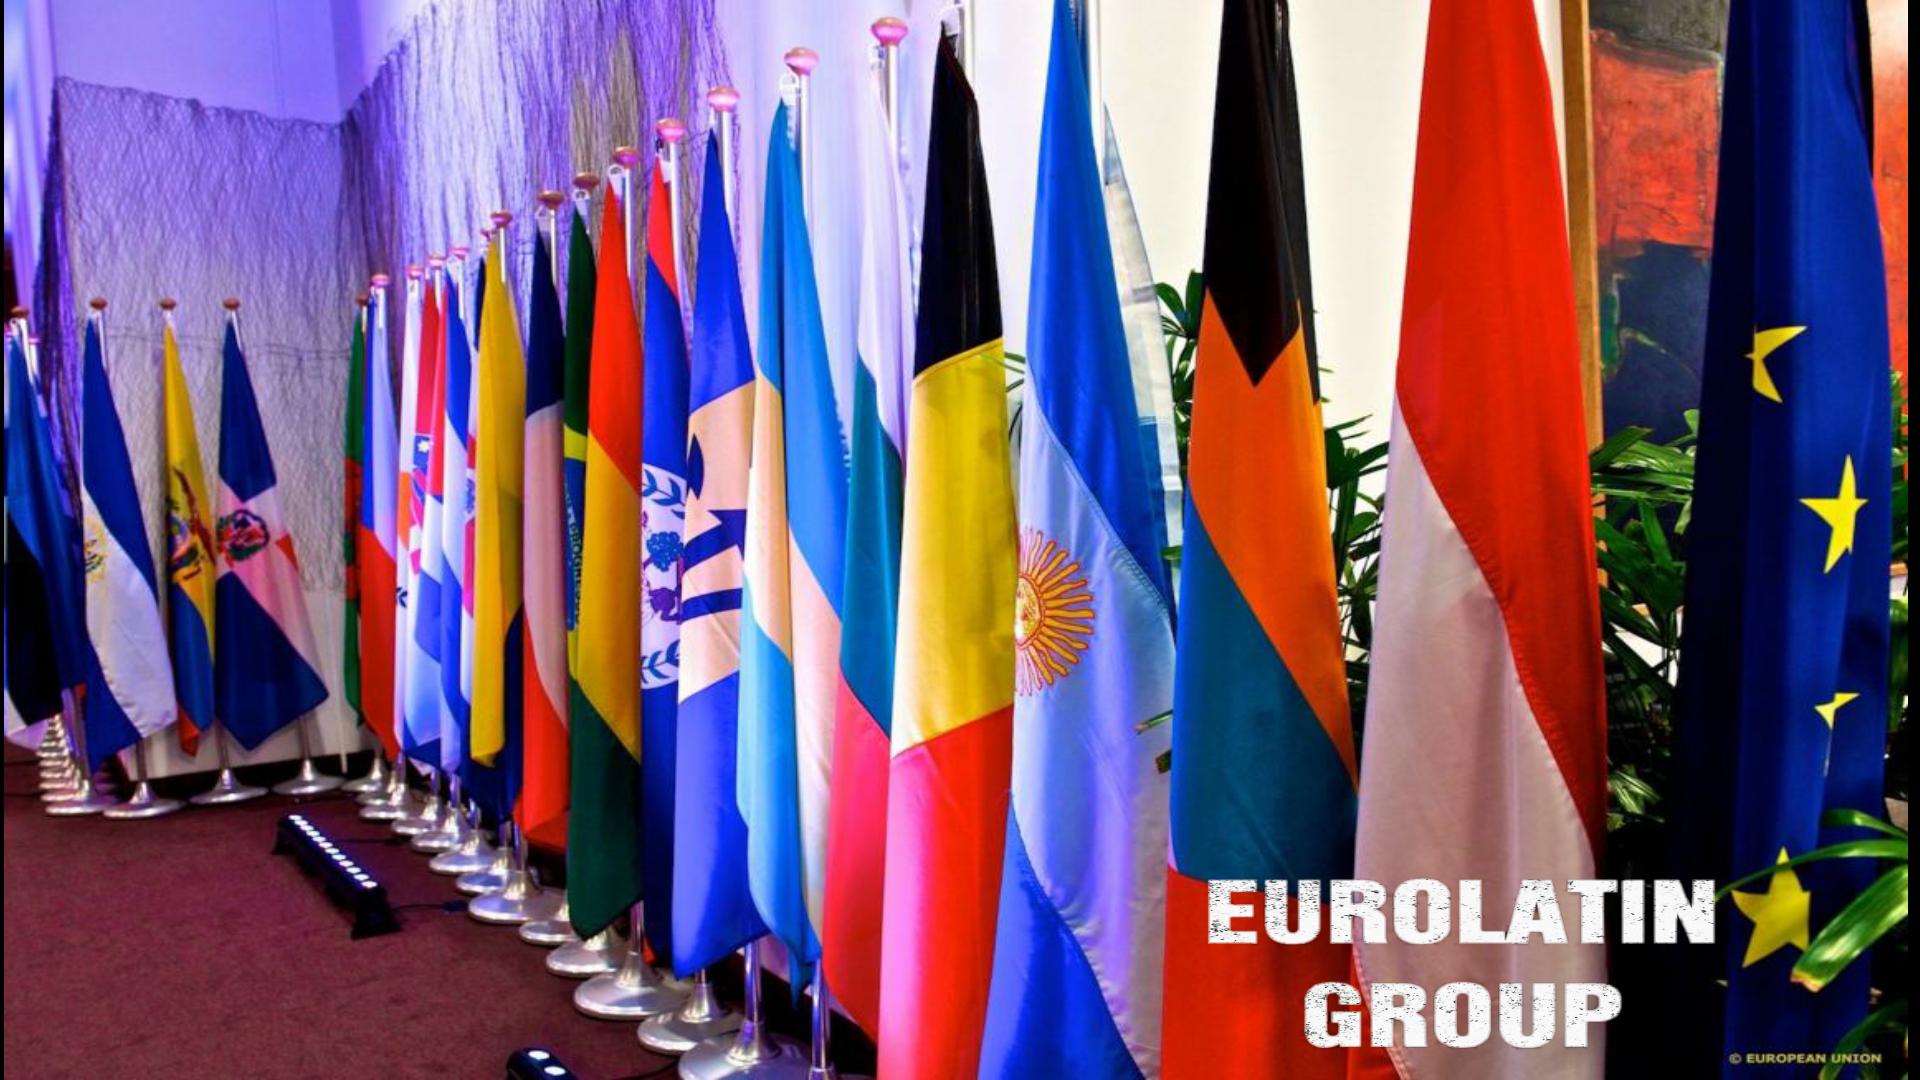 EurolatinGroup